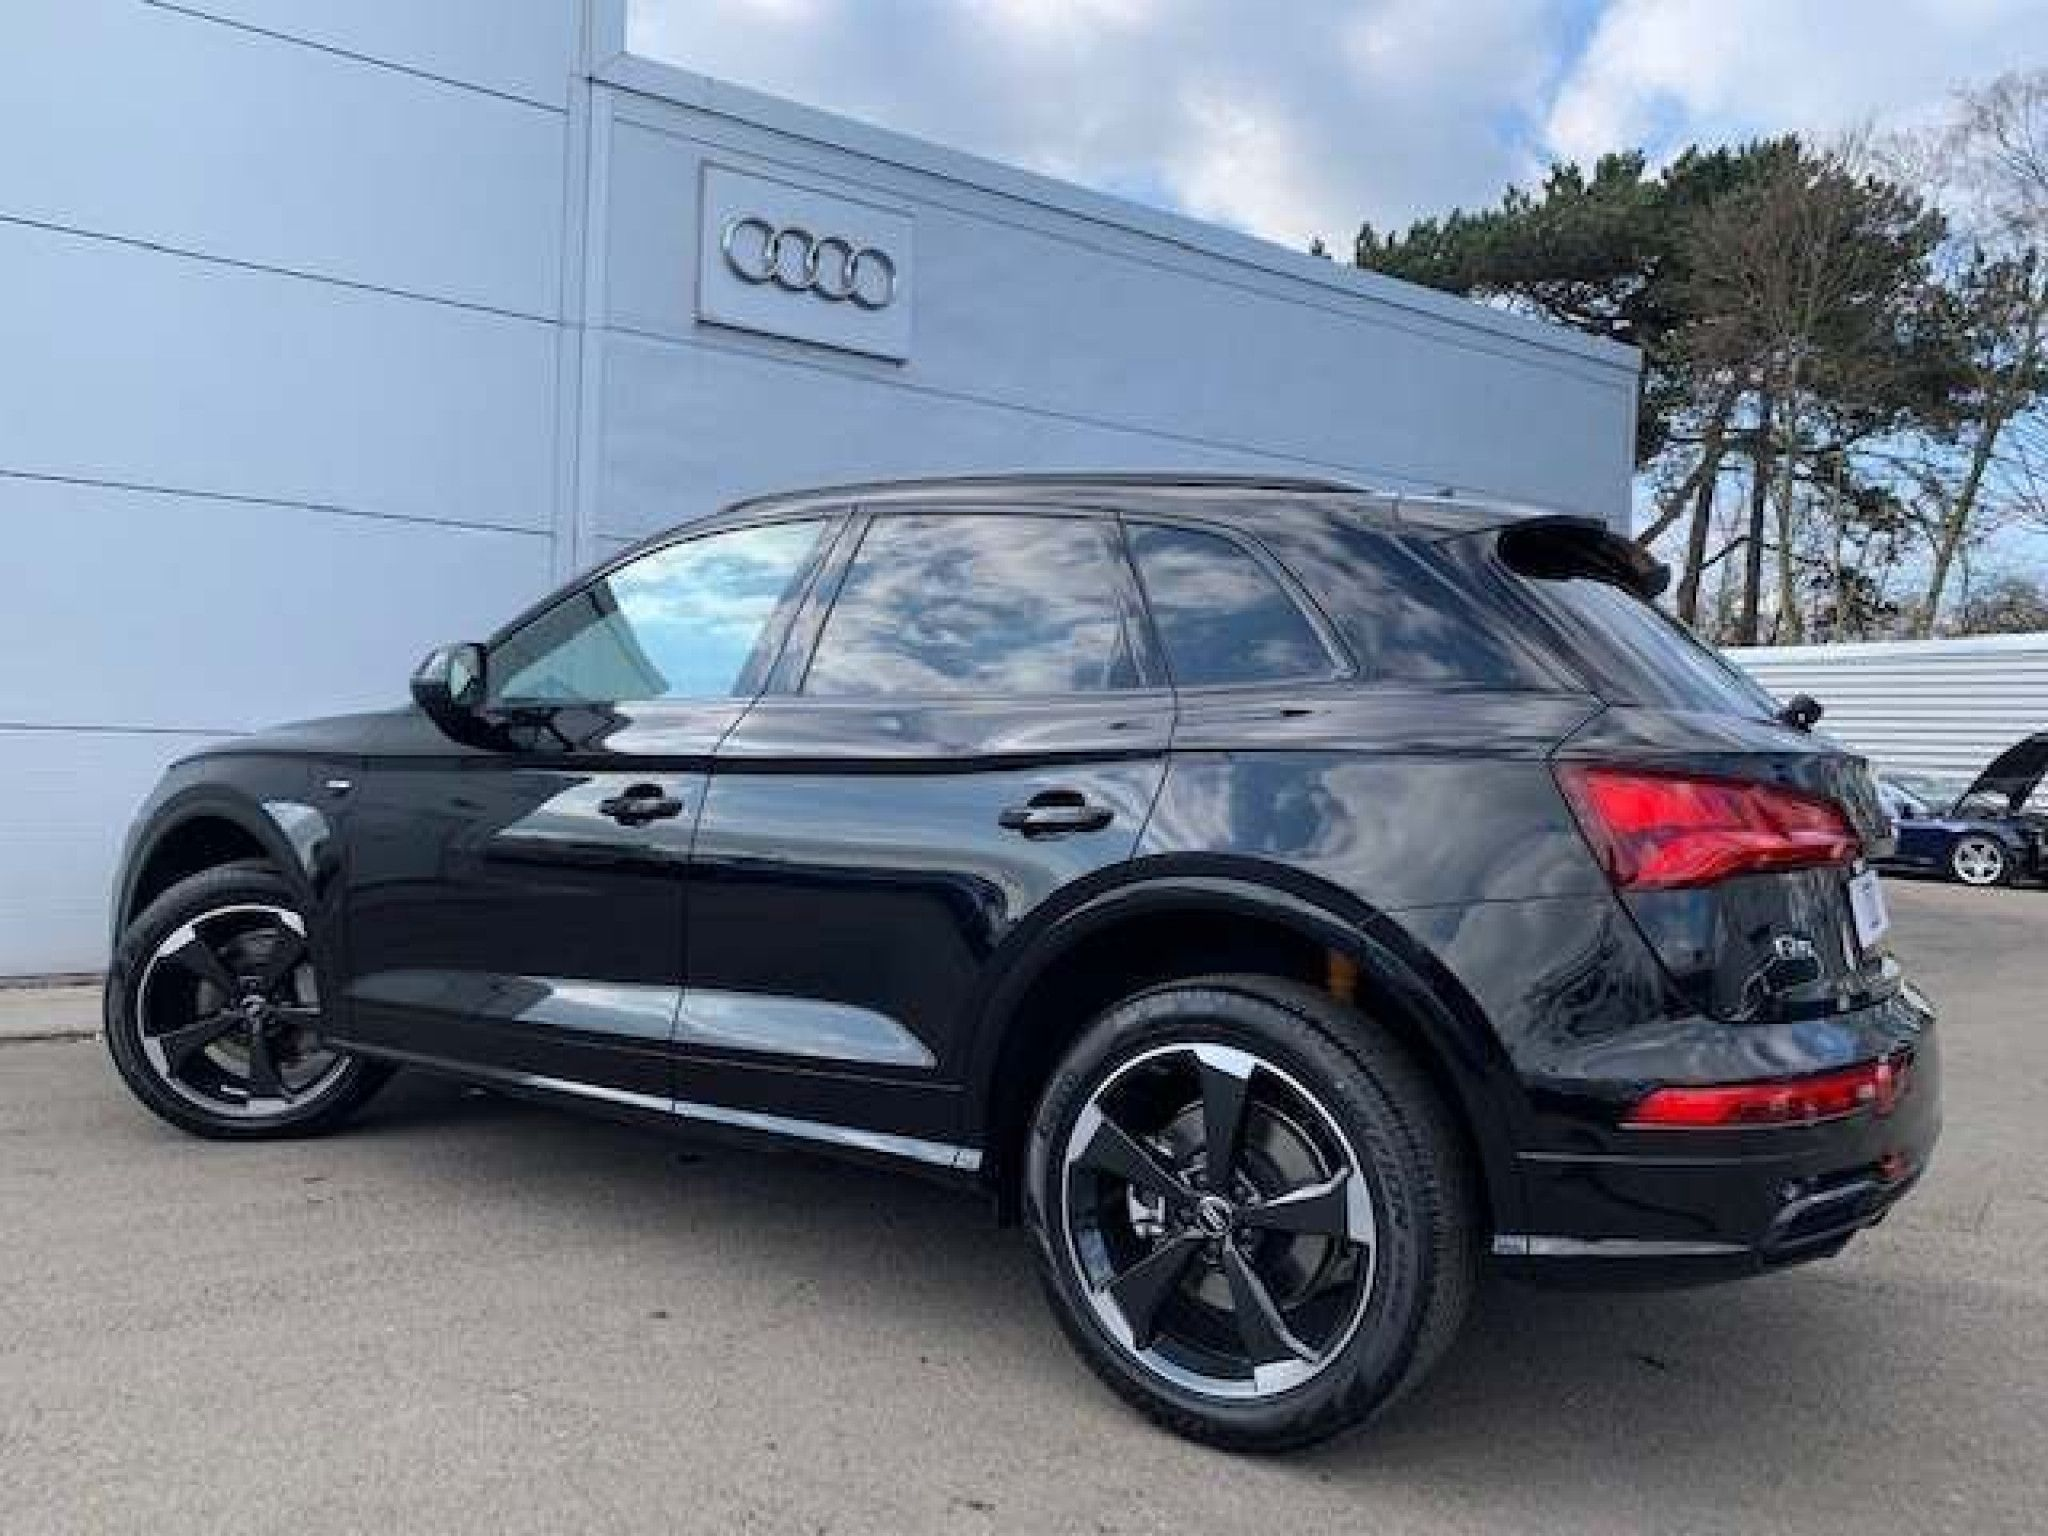 Audi Q20 For Sale Near Me